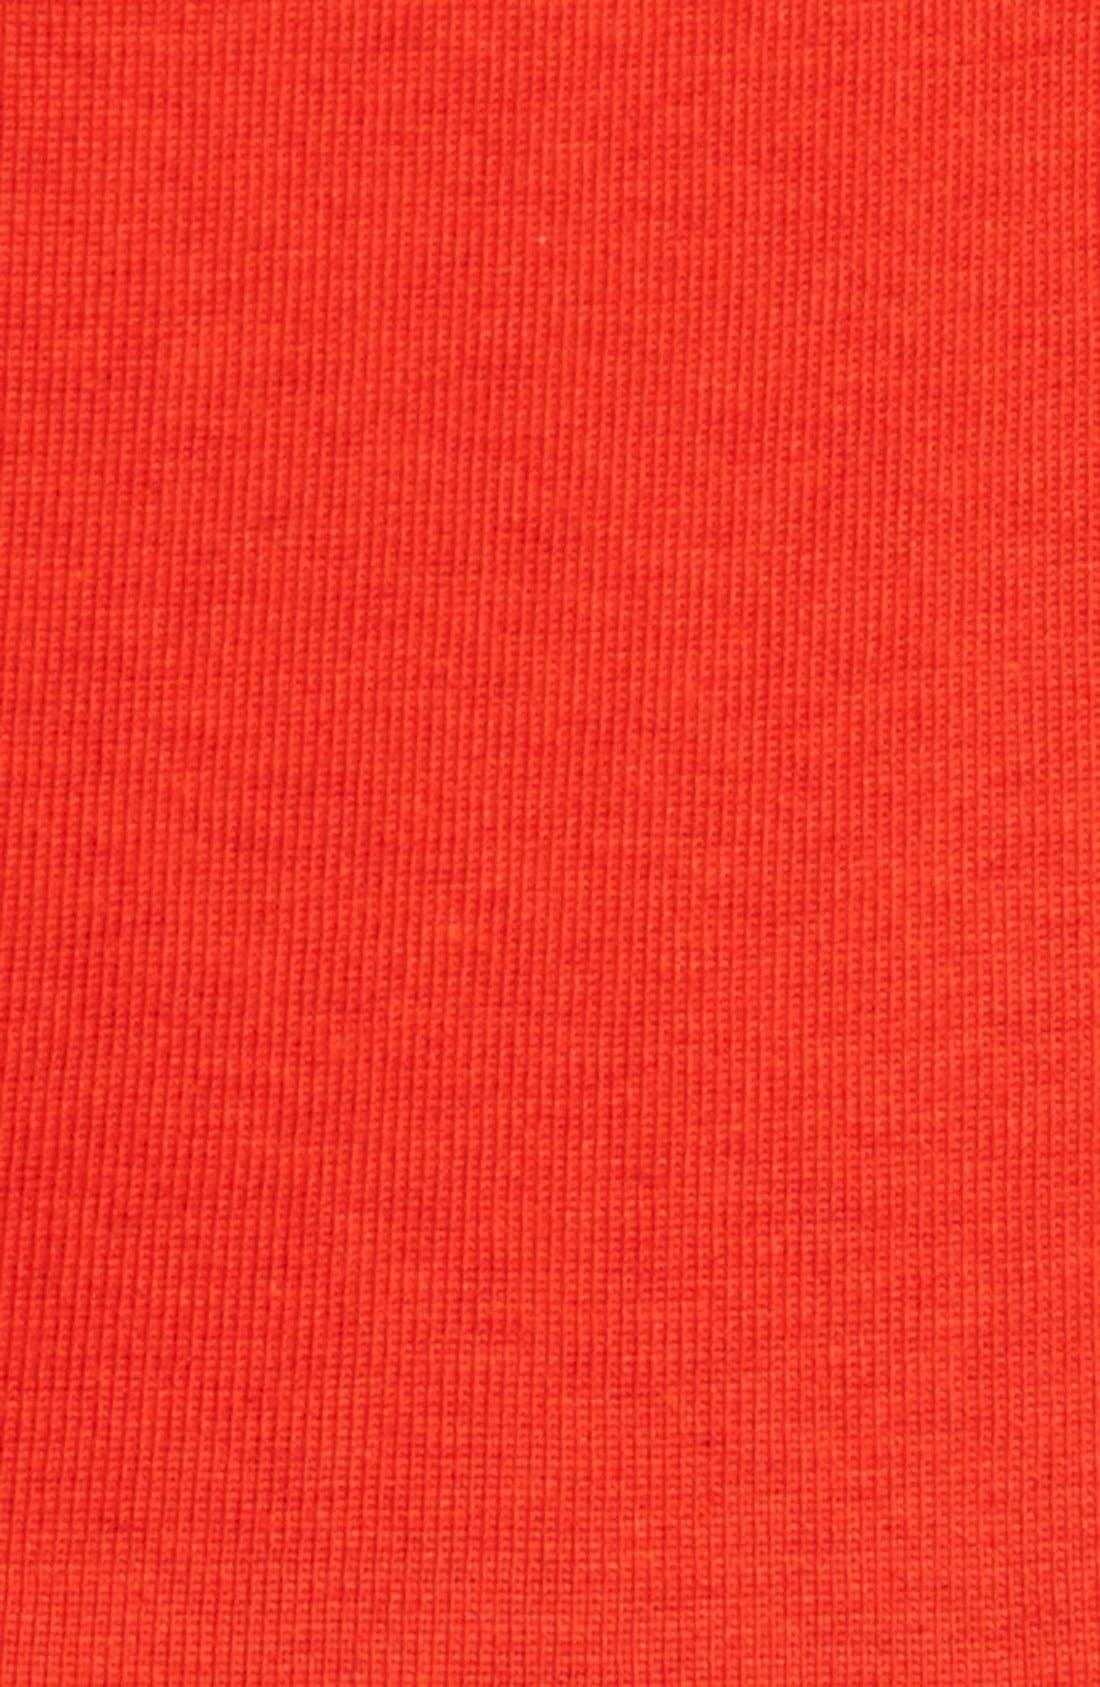 Ballet Neck Cotton & Modal Knit Elbow Sleeve Tee,                             Alternate thumbnail 151, color,